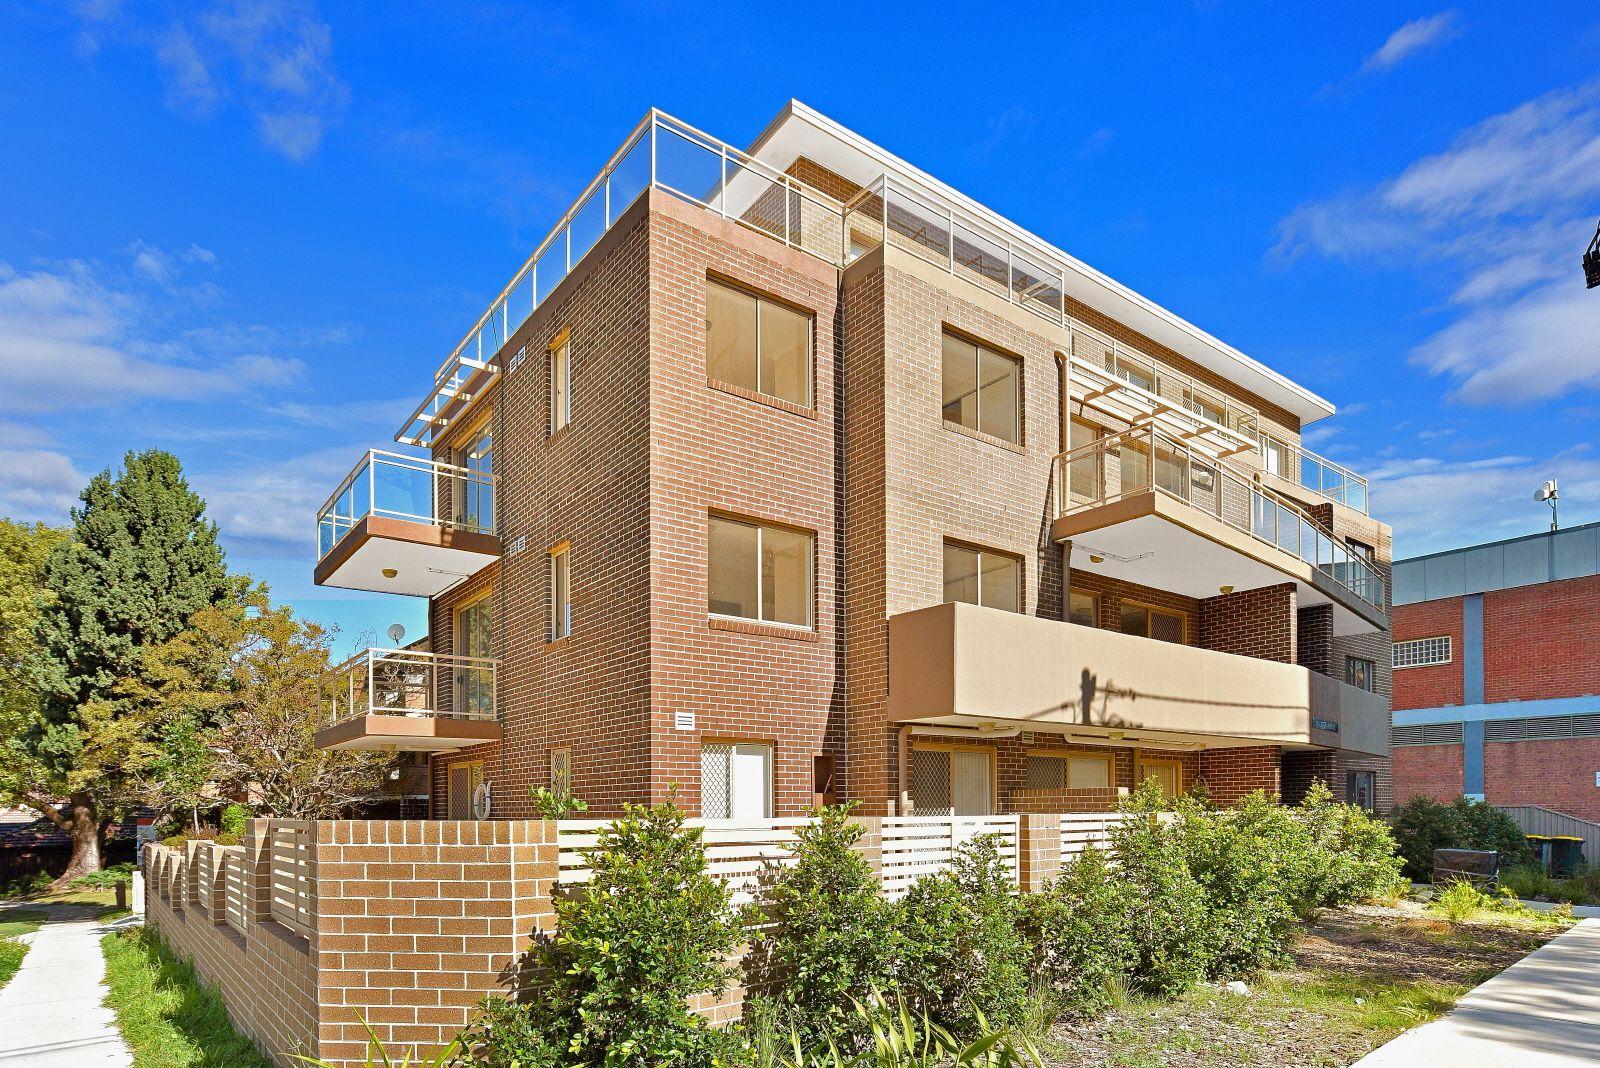 10/1a Lister Avenue, Rockdale NSW 2216, Image 0